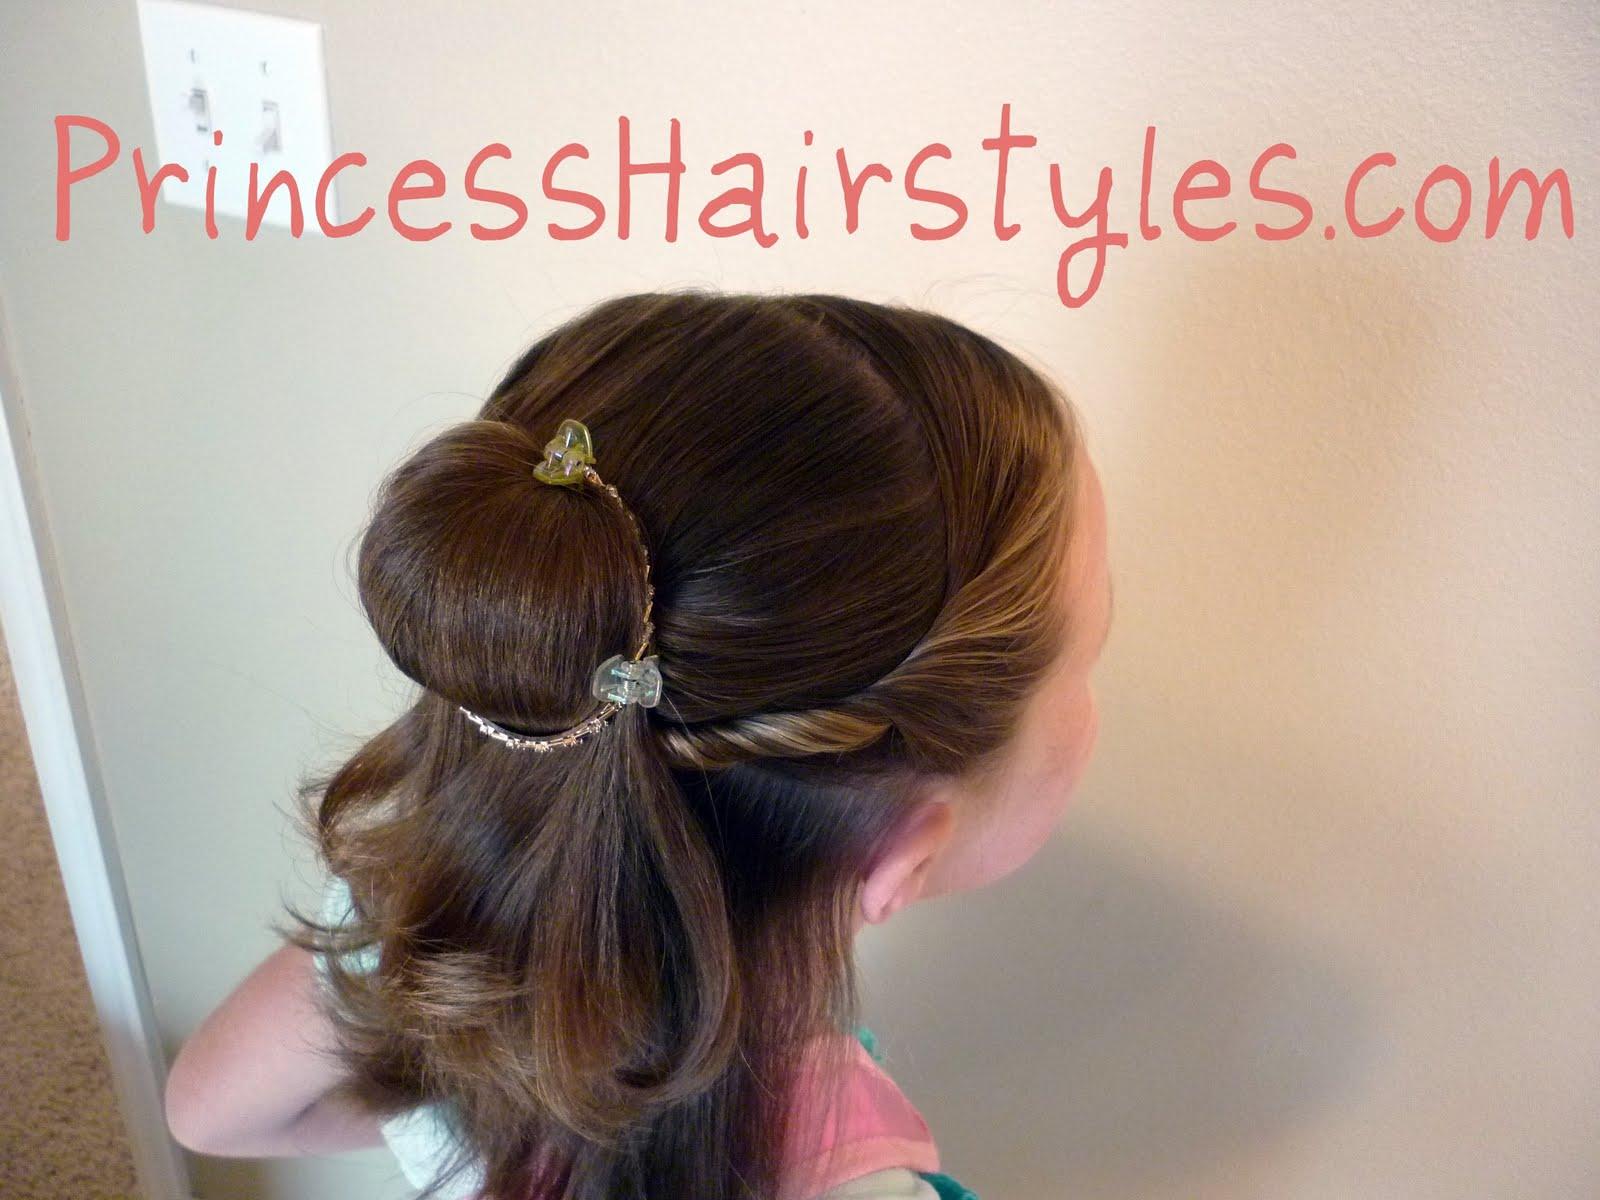 Strange Belle Hairstyle For Short Hair Hairstyles For Girls Princess Short Hairstyles Gunalazisus